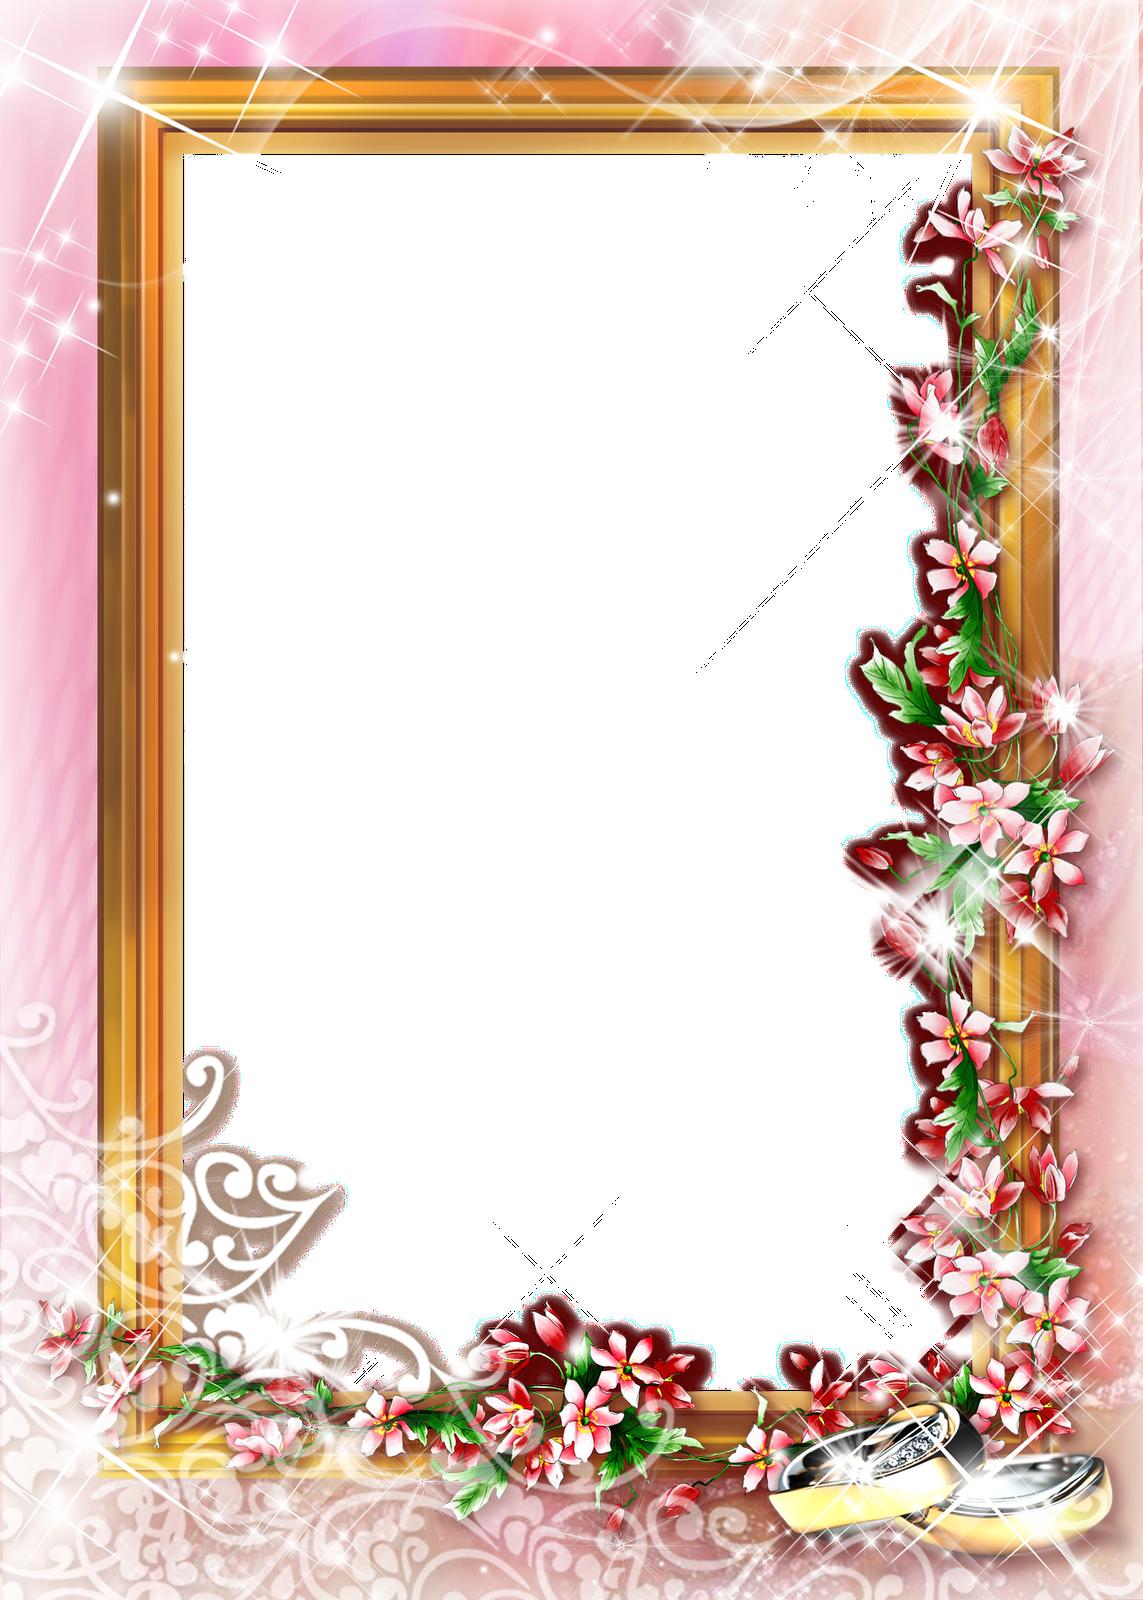 Marcos para decorar elegant diseo de espejos con objetos for Para adornar fotos